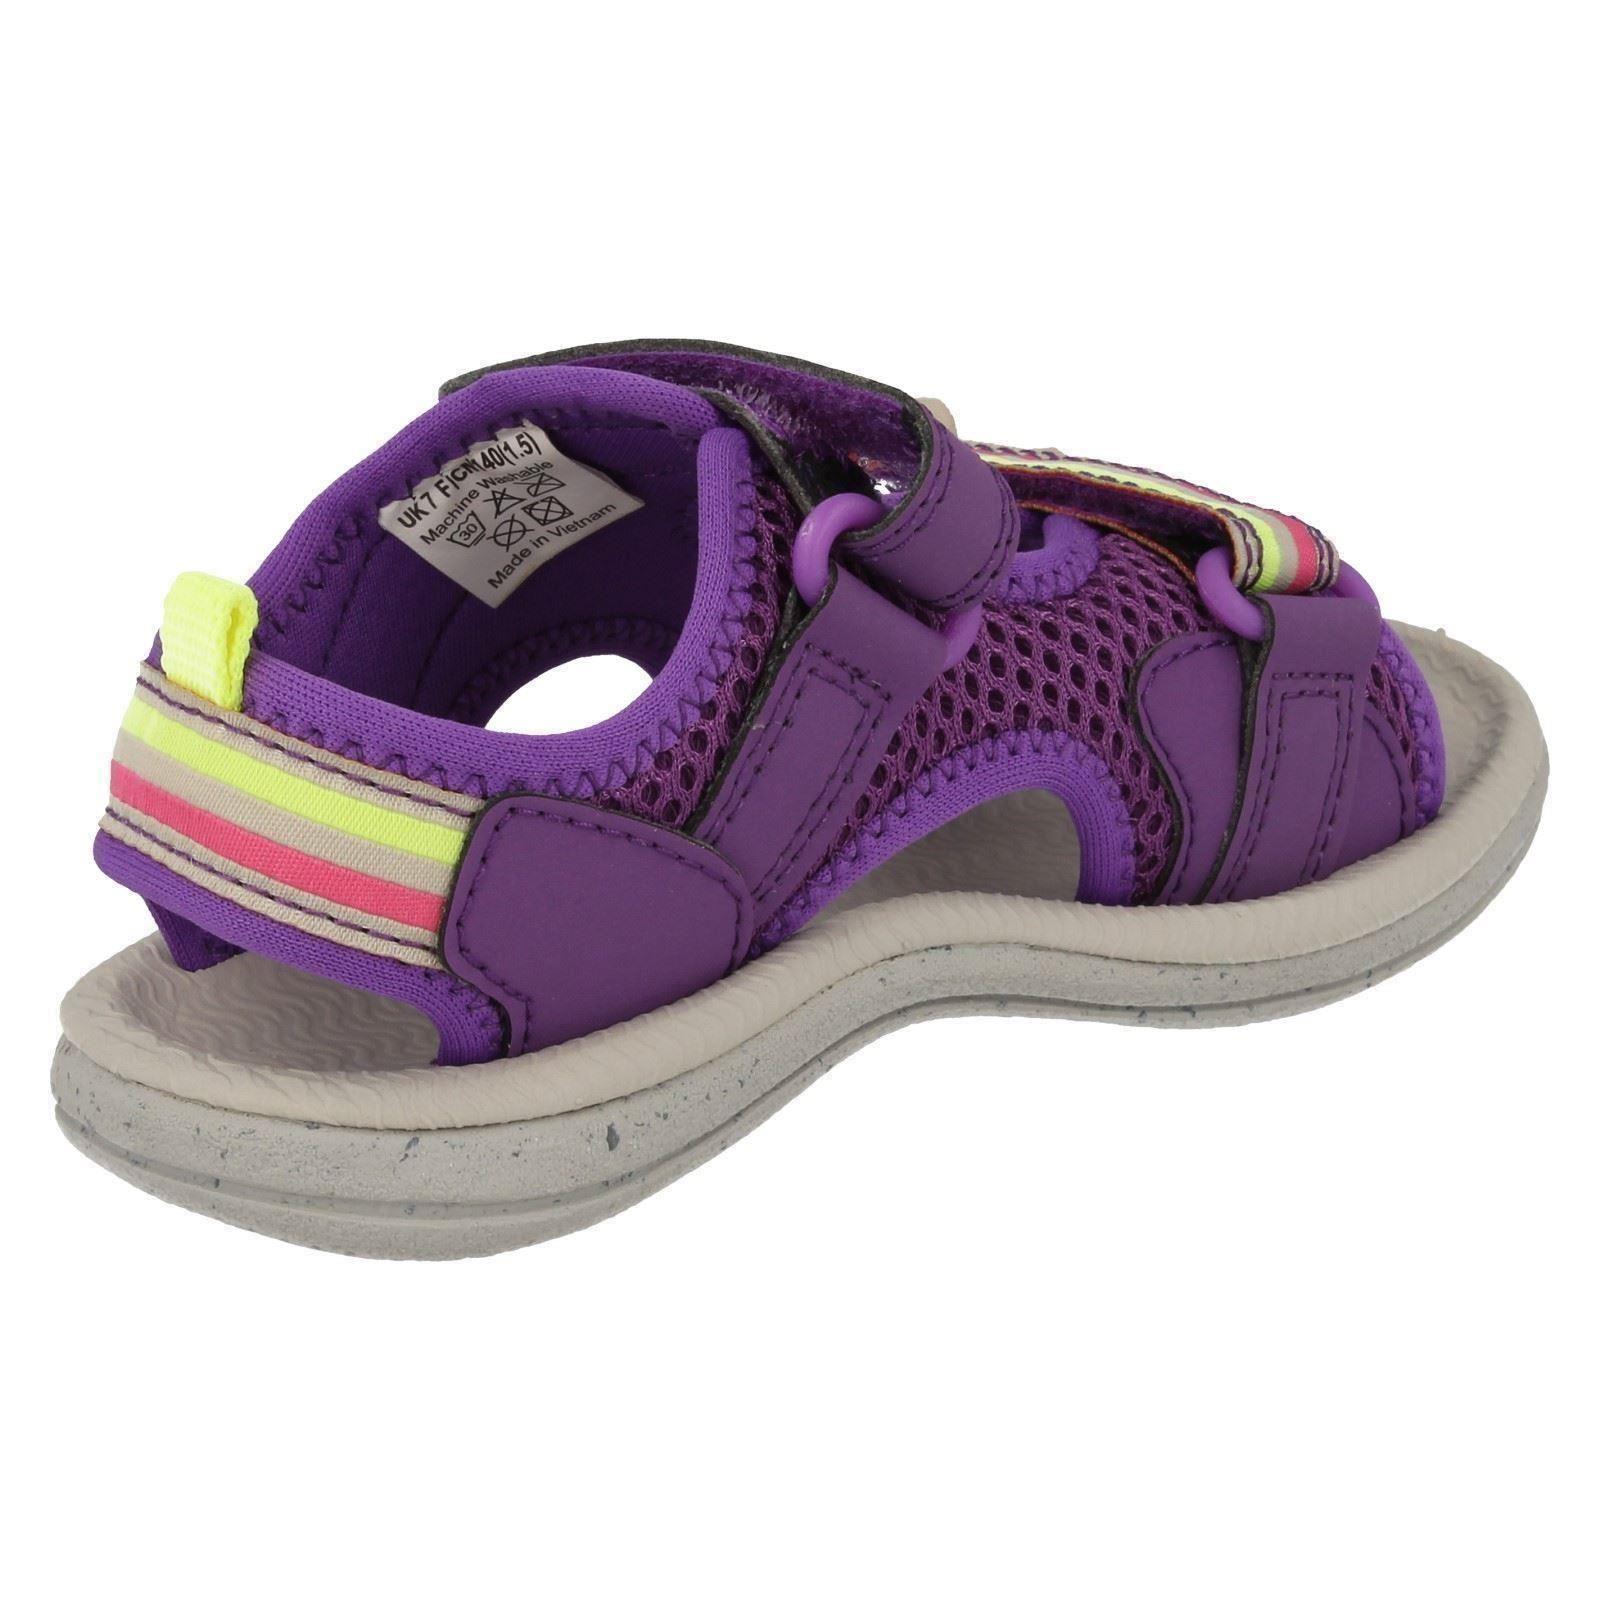 a84b4e2afca9 039-Clarks-Girls-039-Sandals-Star-Games thumbnail 40